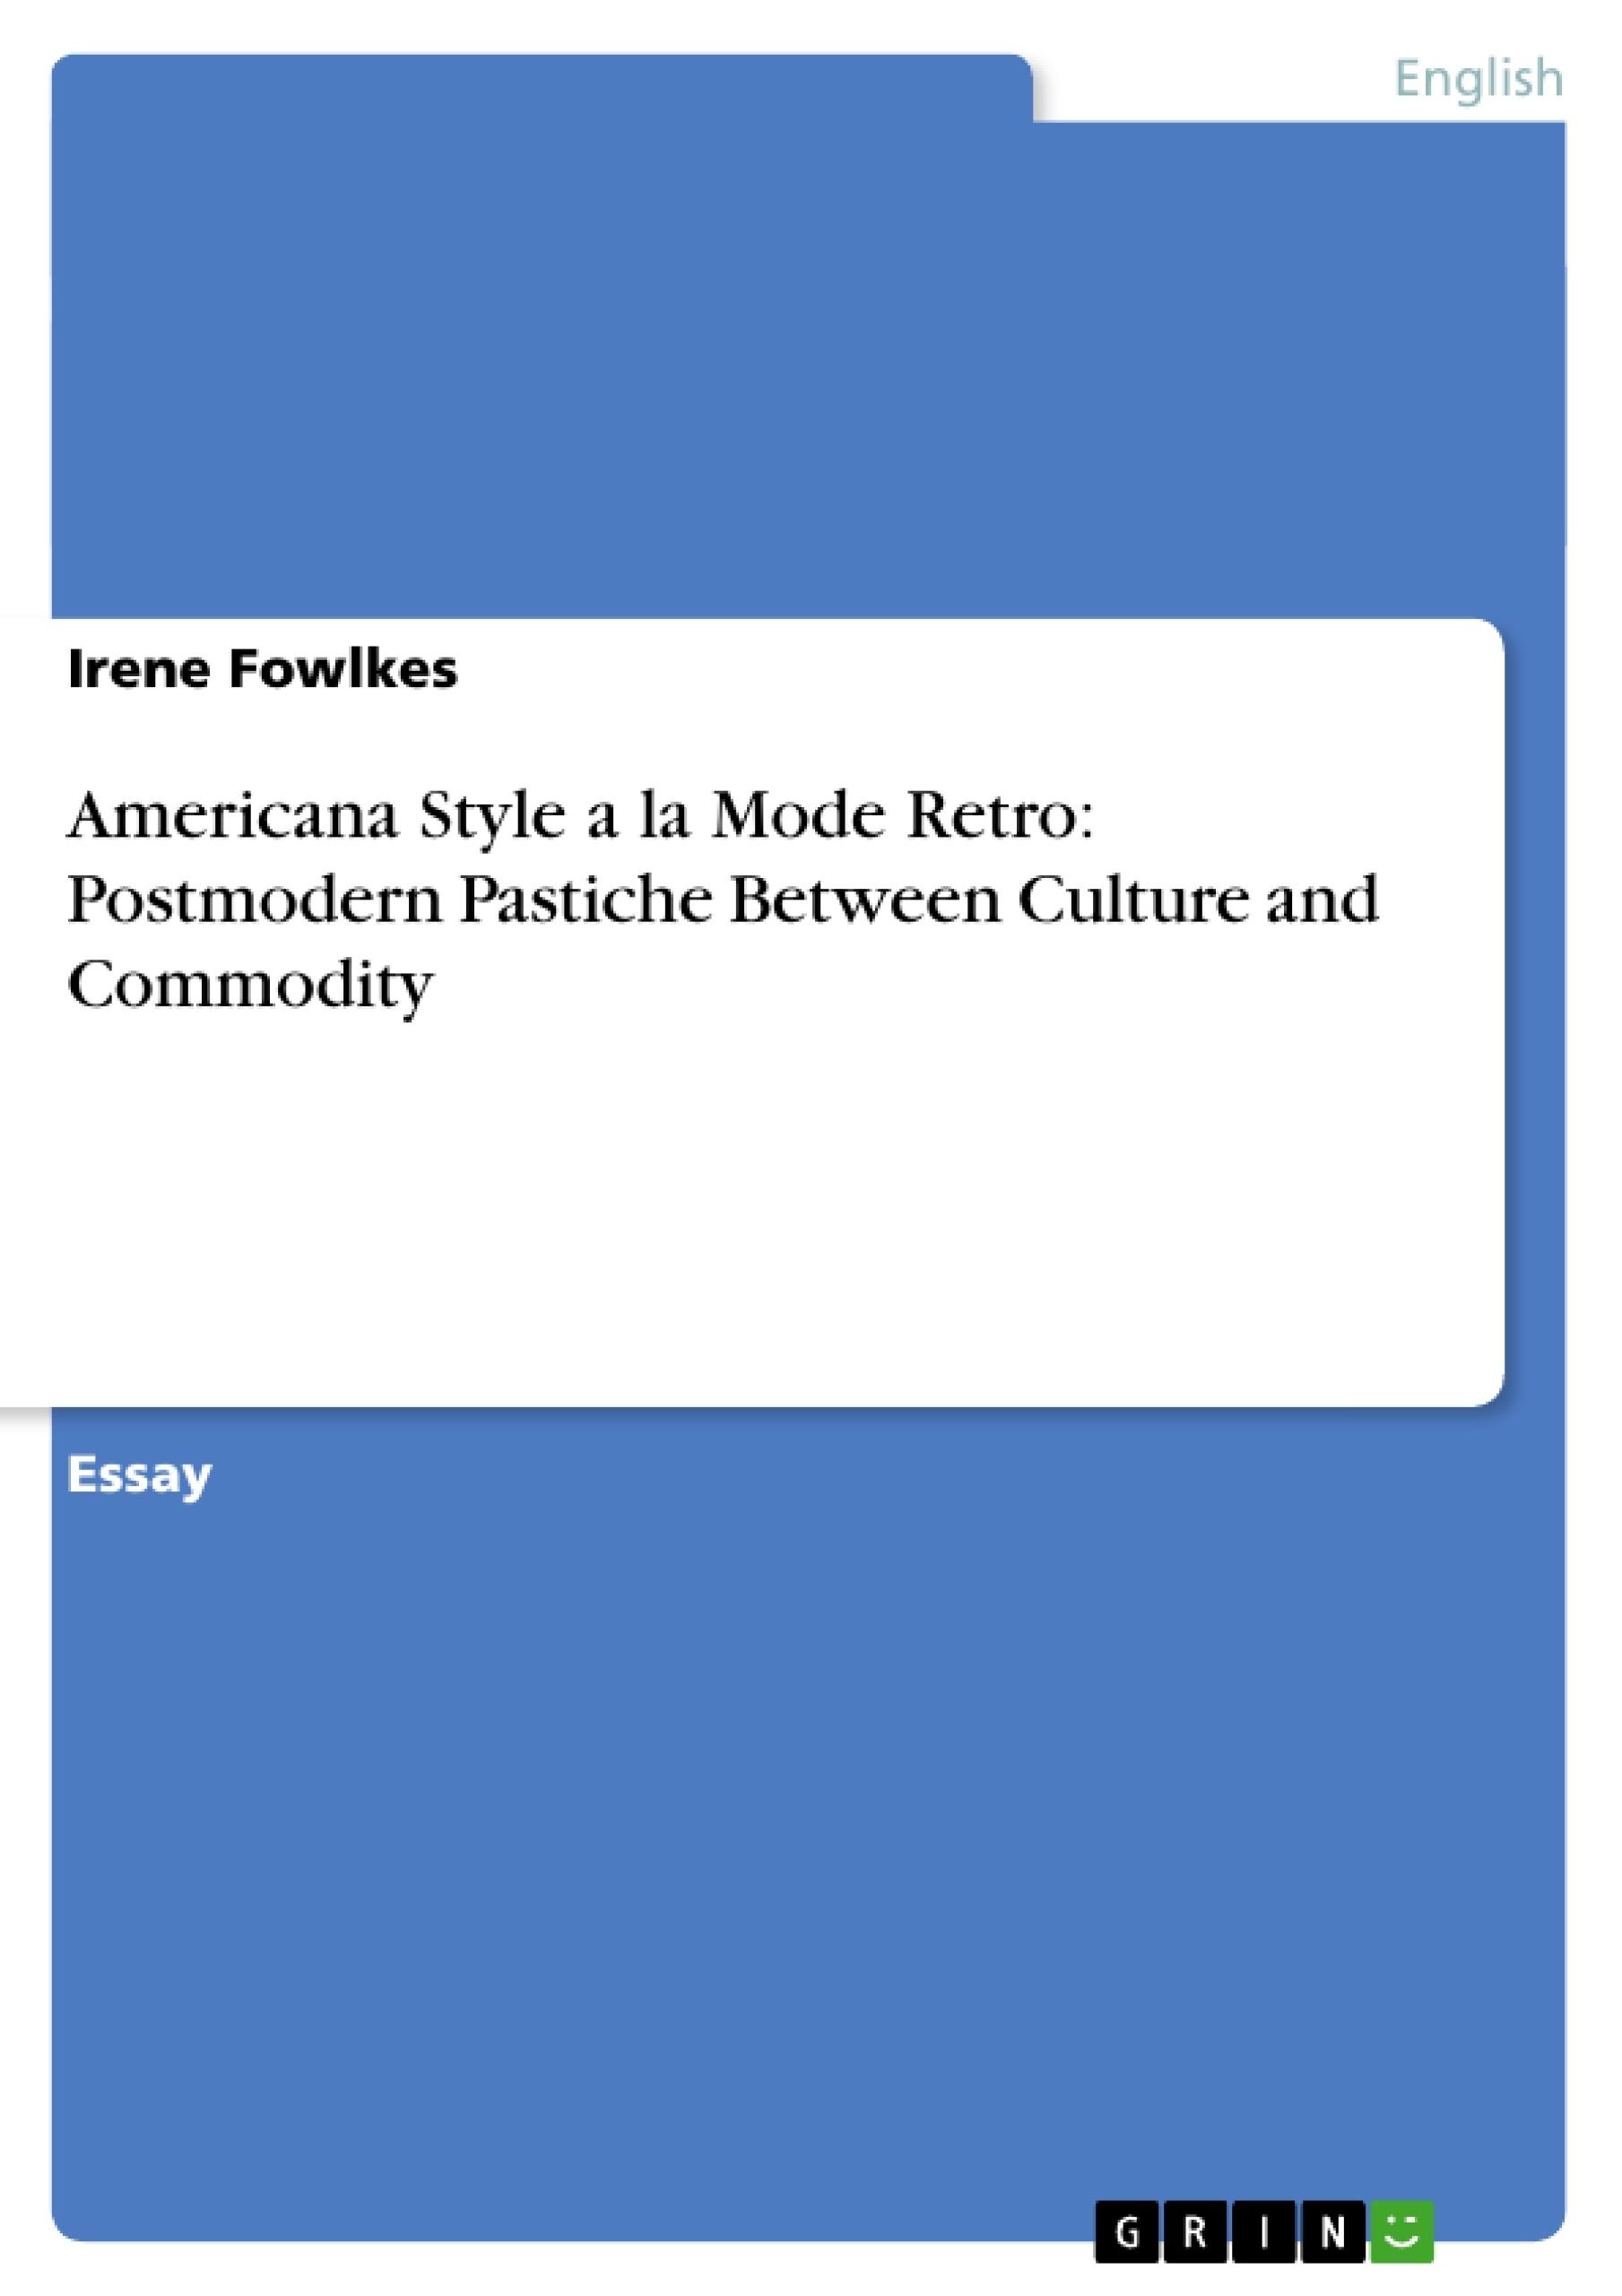 Title: Americana Style a la Mode Retro: Postmodern Pastiche Between Culture and Commodity